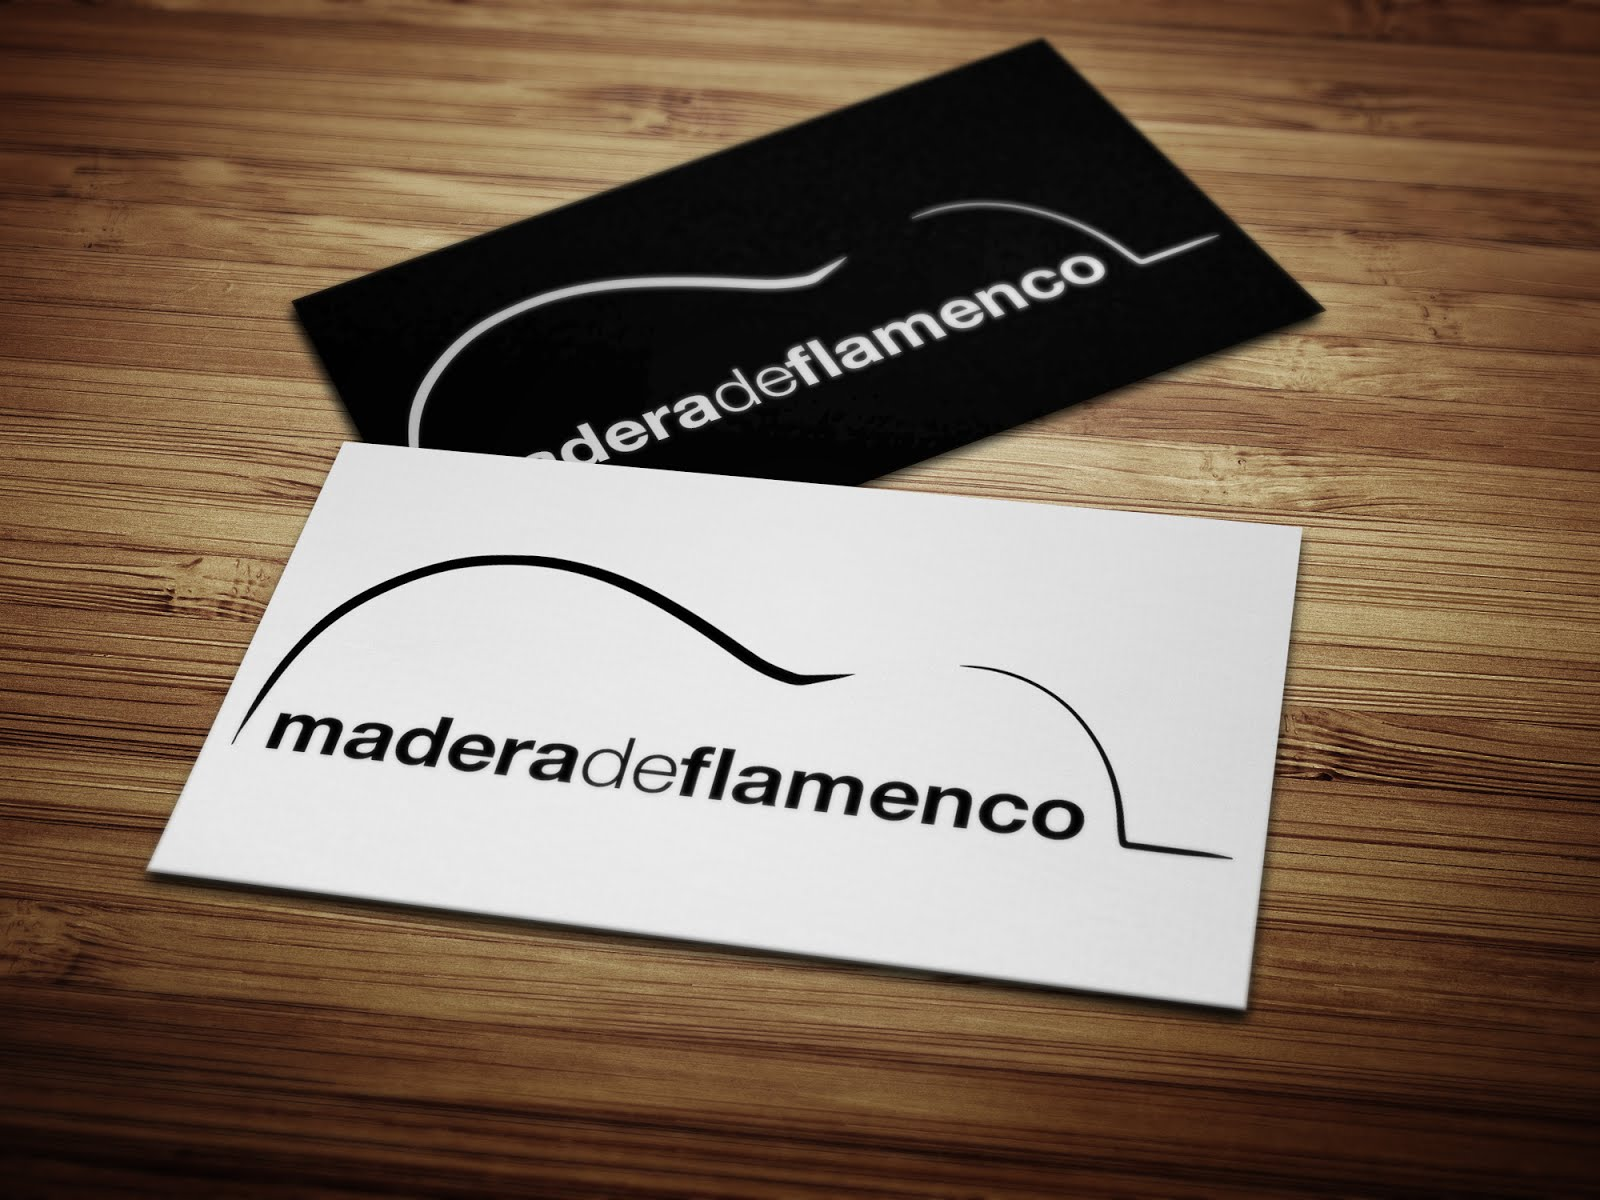 ¿Quieres aprender a tocar la Guitarra? ¿quieres regalar flamenco?